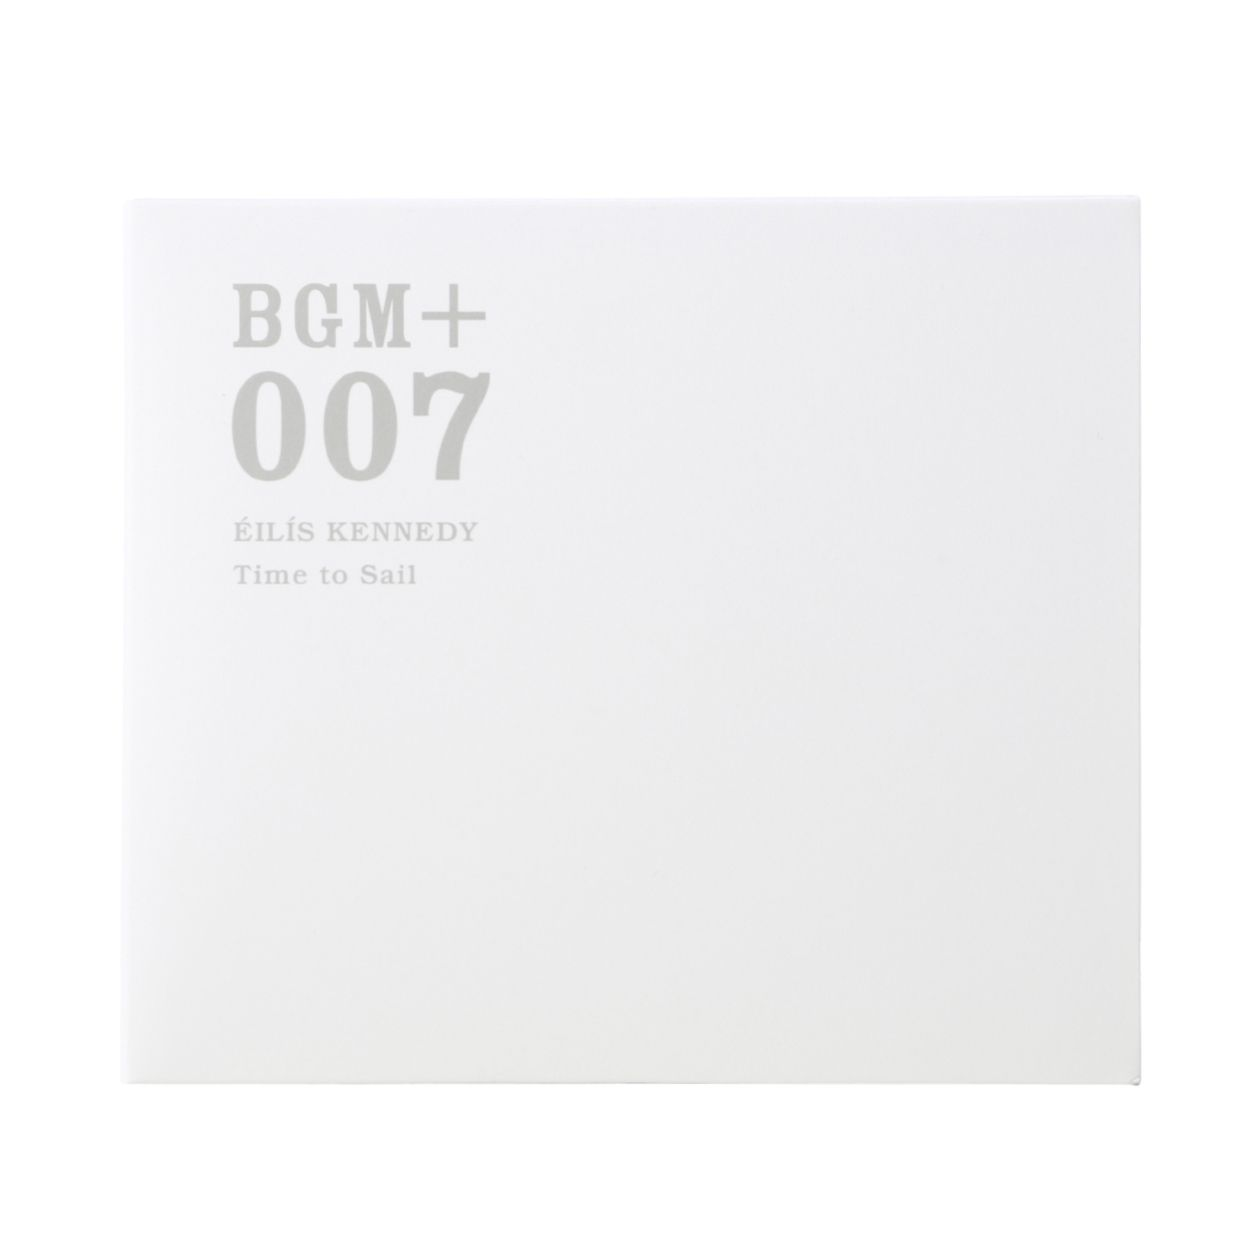 BGM+007